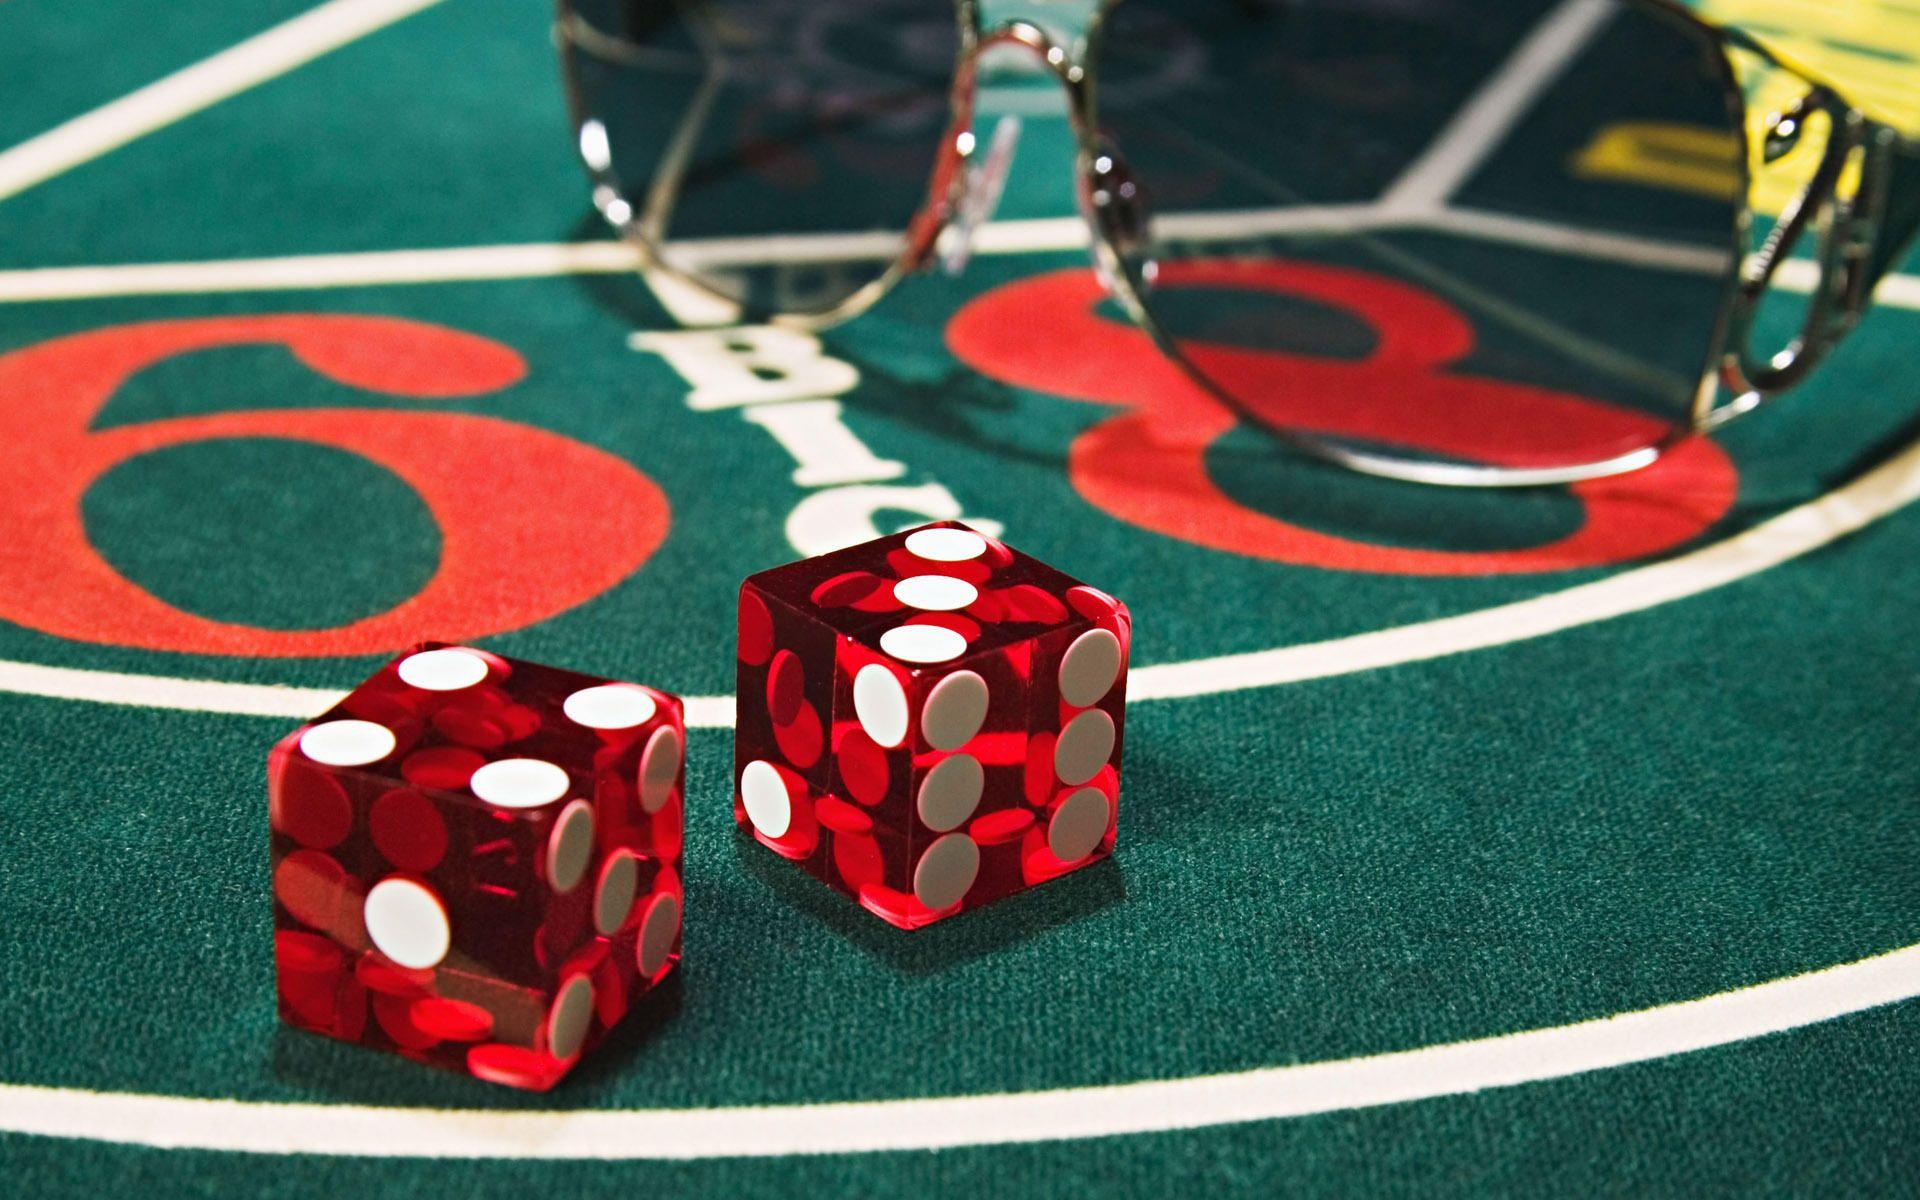 Arlingtonclubny is the best Online Gambling Site (Situs Judi Online)